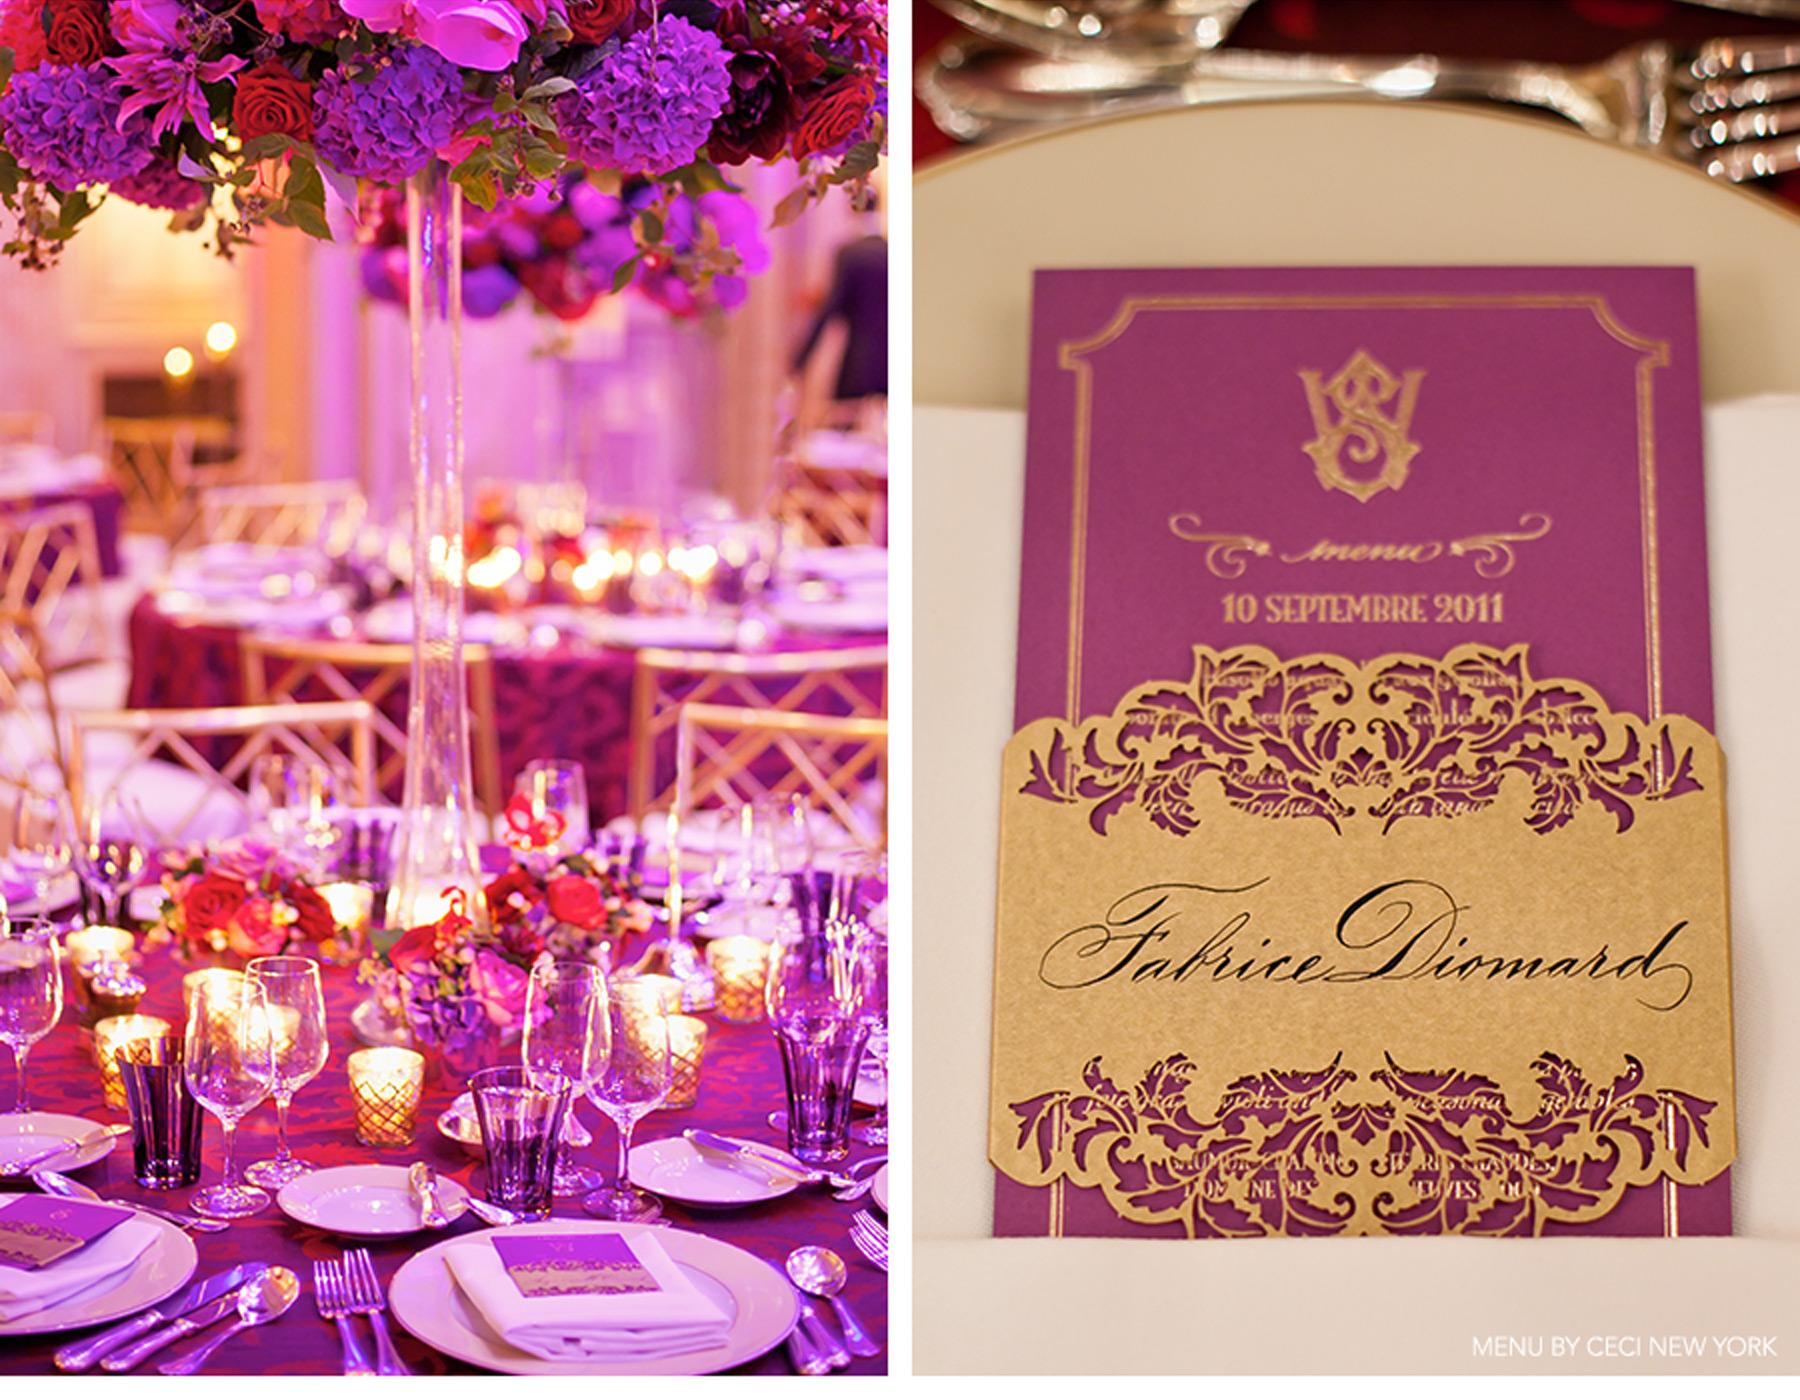 Purple plus gold equals elegance myweddingfavors wedding tips purple plus gold equals elegance junglespirit Choice Image